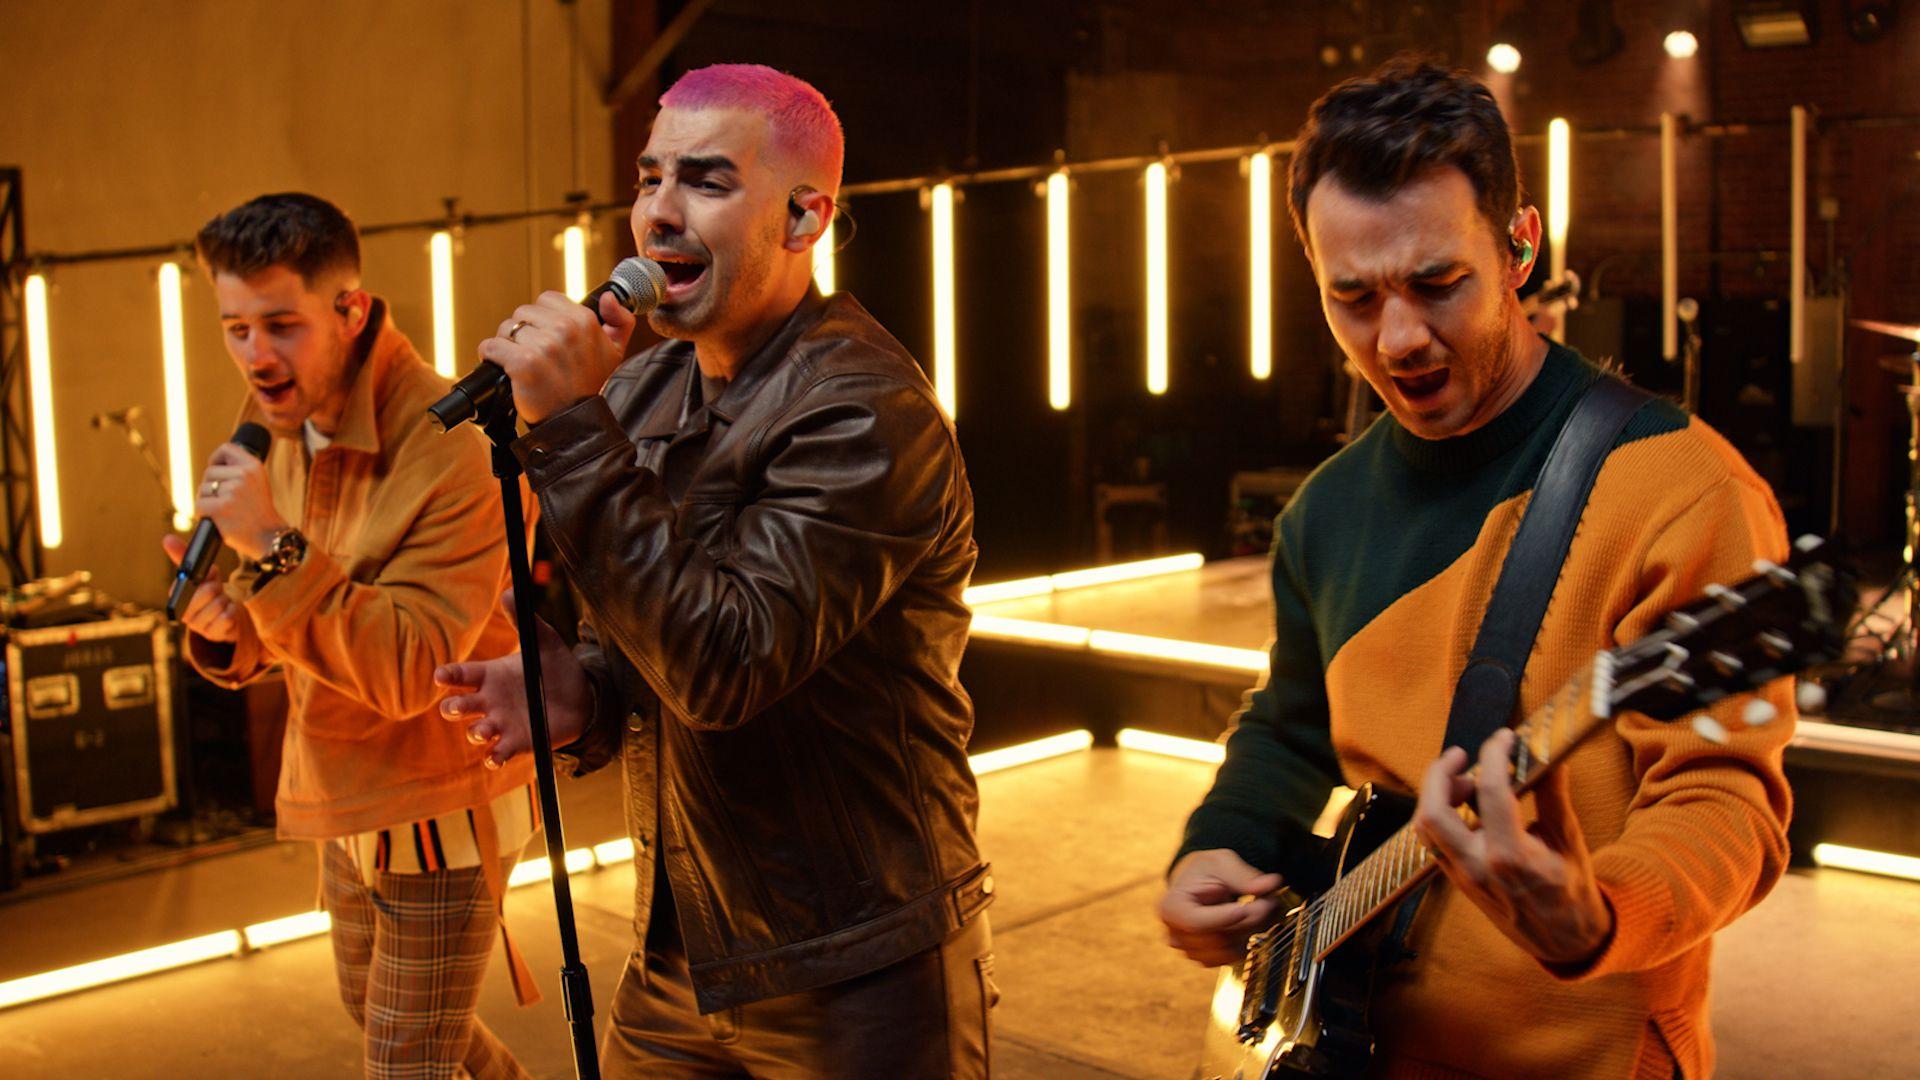 The Jonas Brothers virtual concert